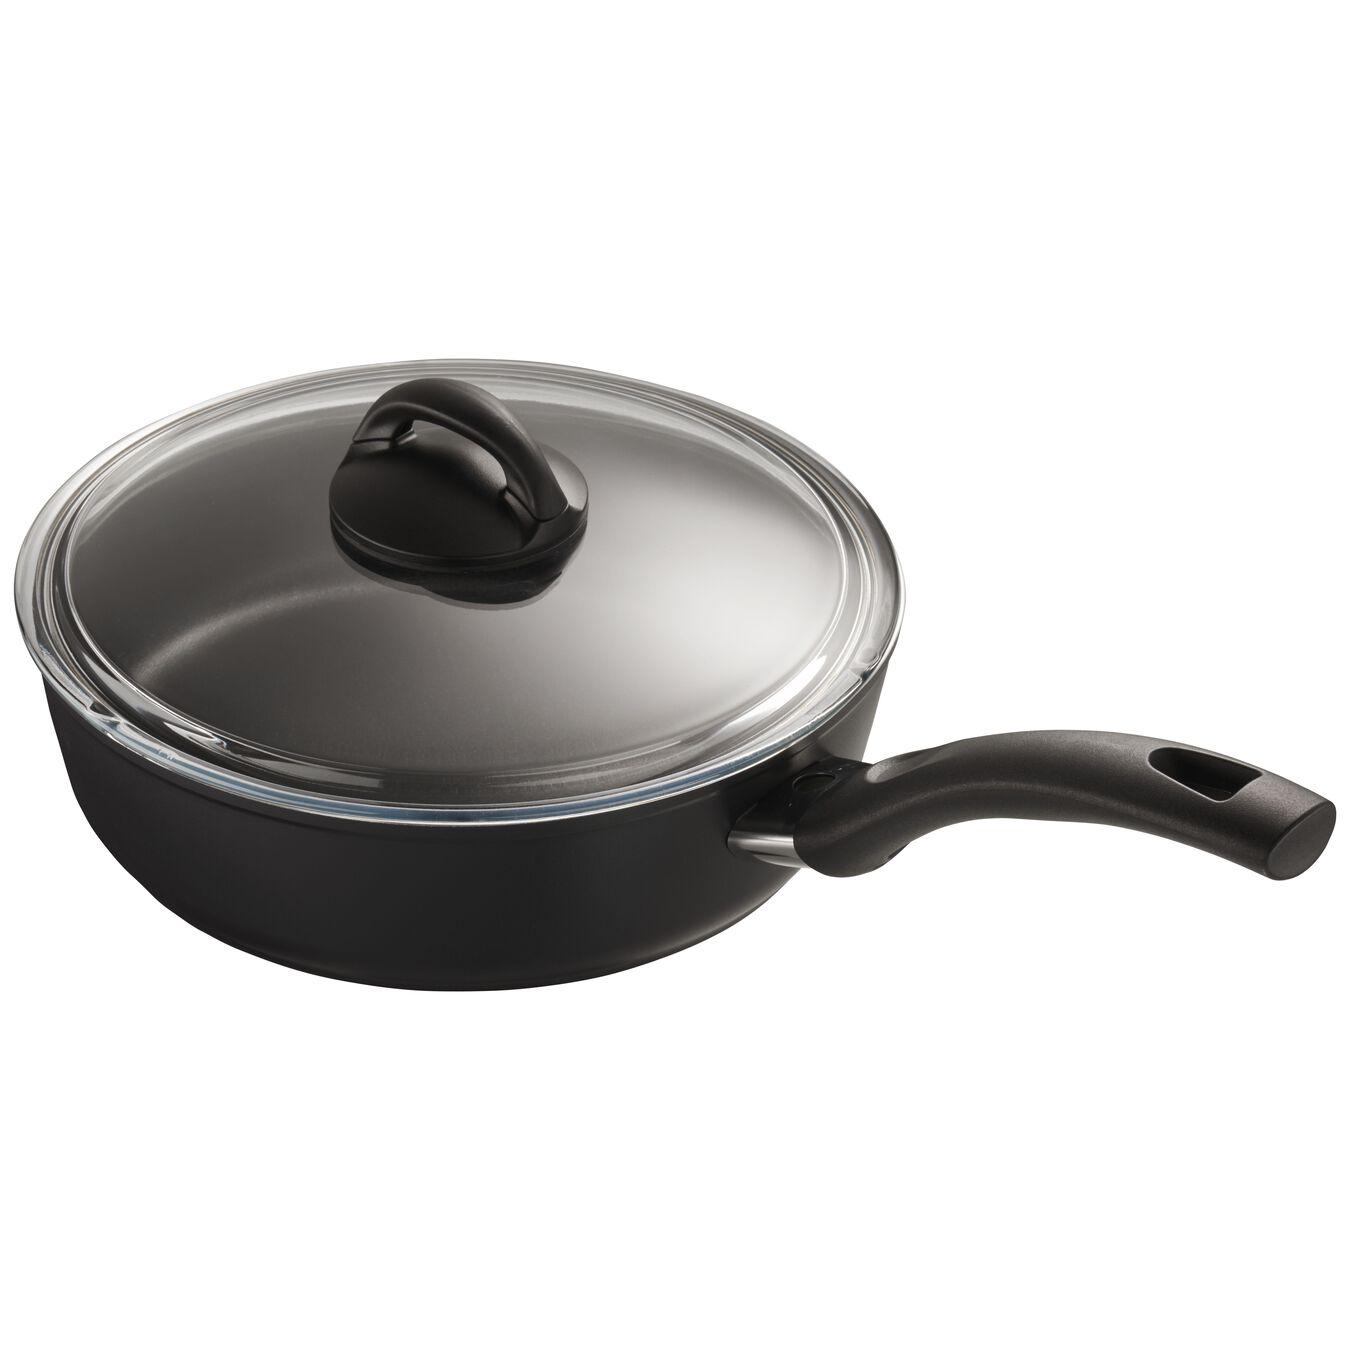 2.9-qt Nonstick Saute Pan with Lid,,large 2